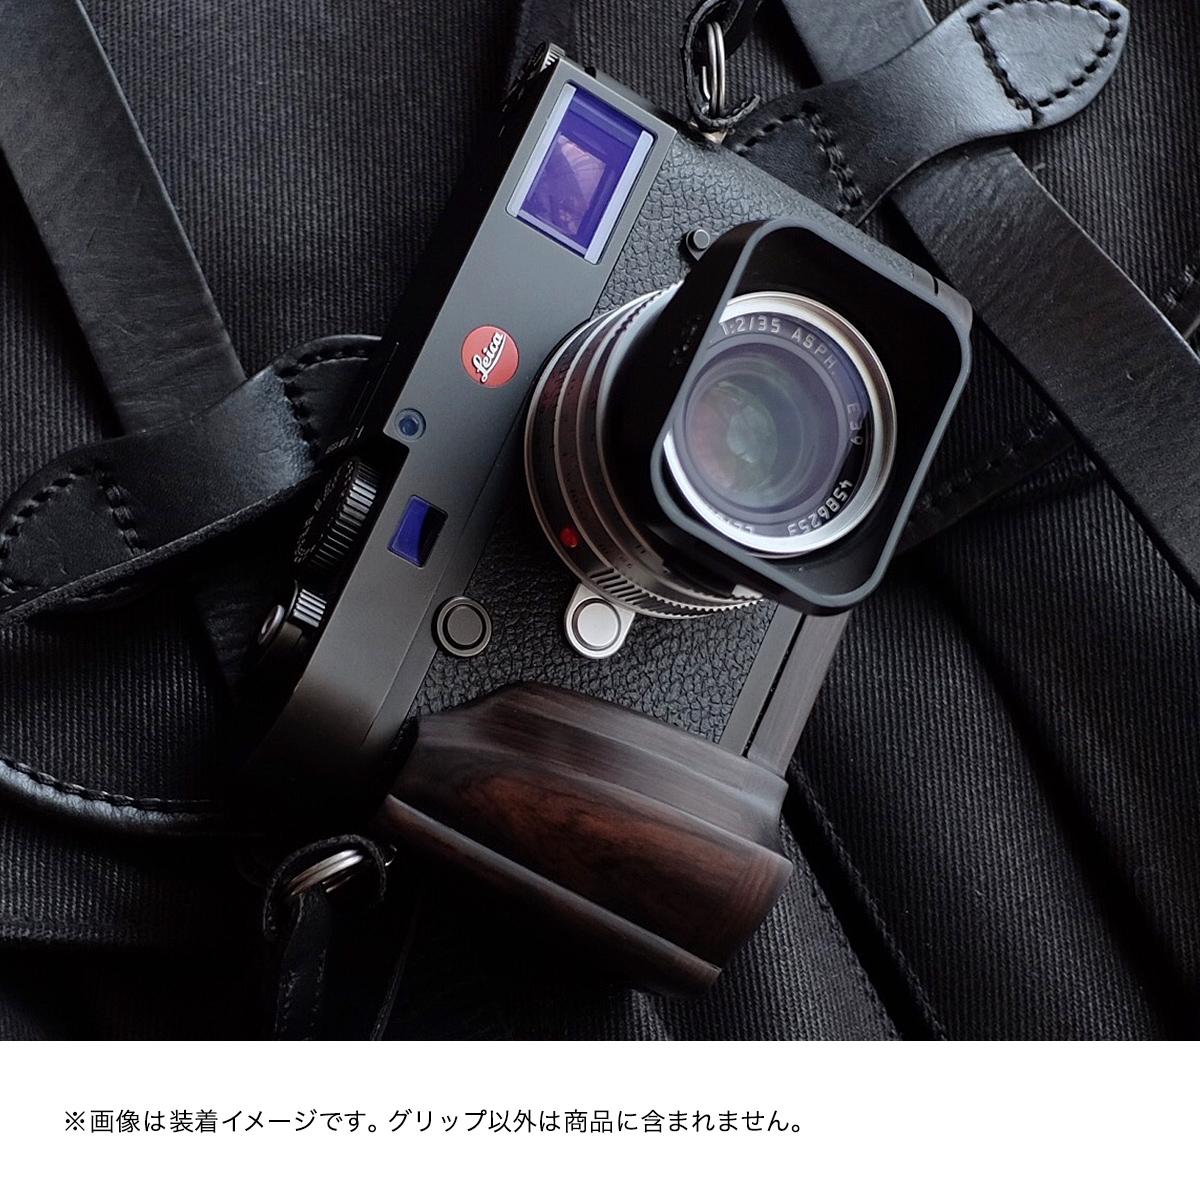 SHOTEN カメラウッドグリップ M10-GP|LEICA M10シリーズ 用